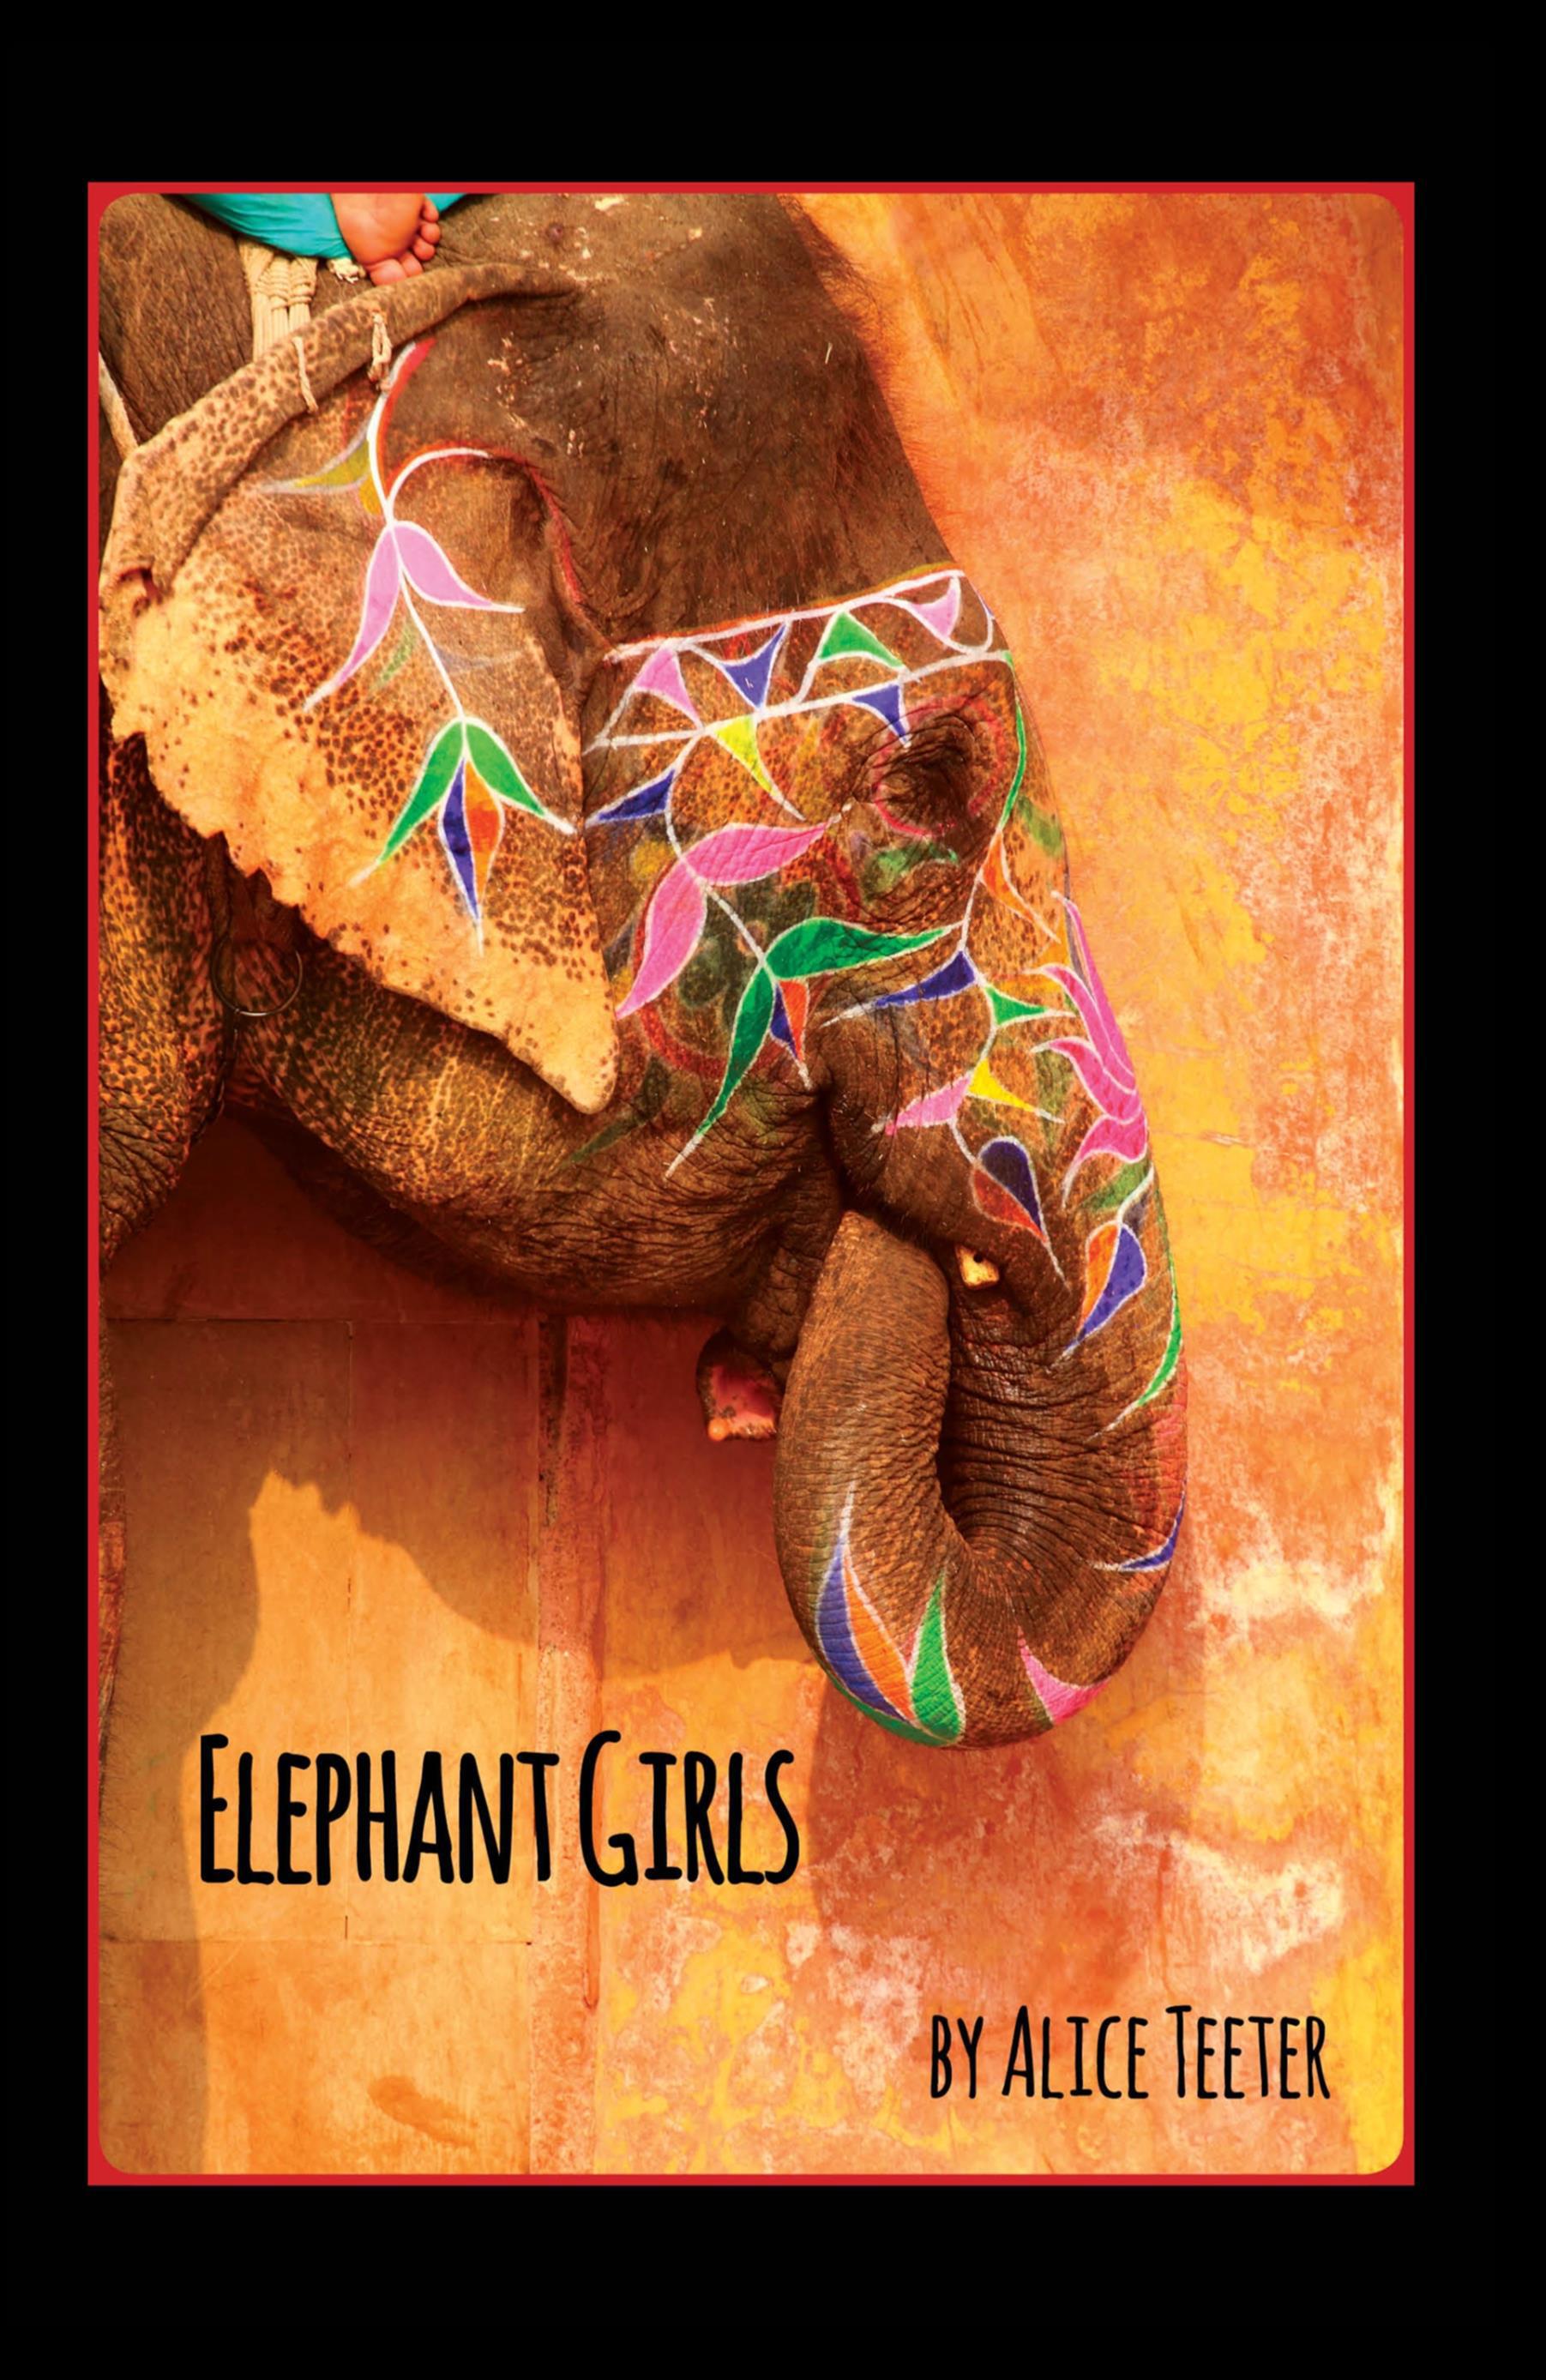 https://www.charisbooksandmore.com/sites/charisbooksandmore.com/files/ELEPHANT-GIRLS-FRONT-COVER.jpg